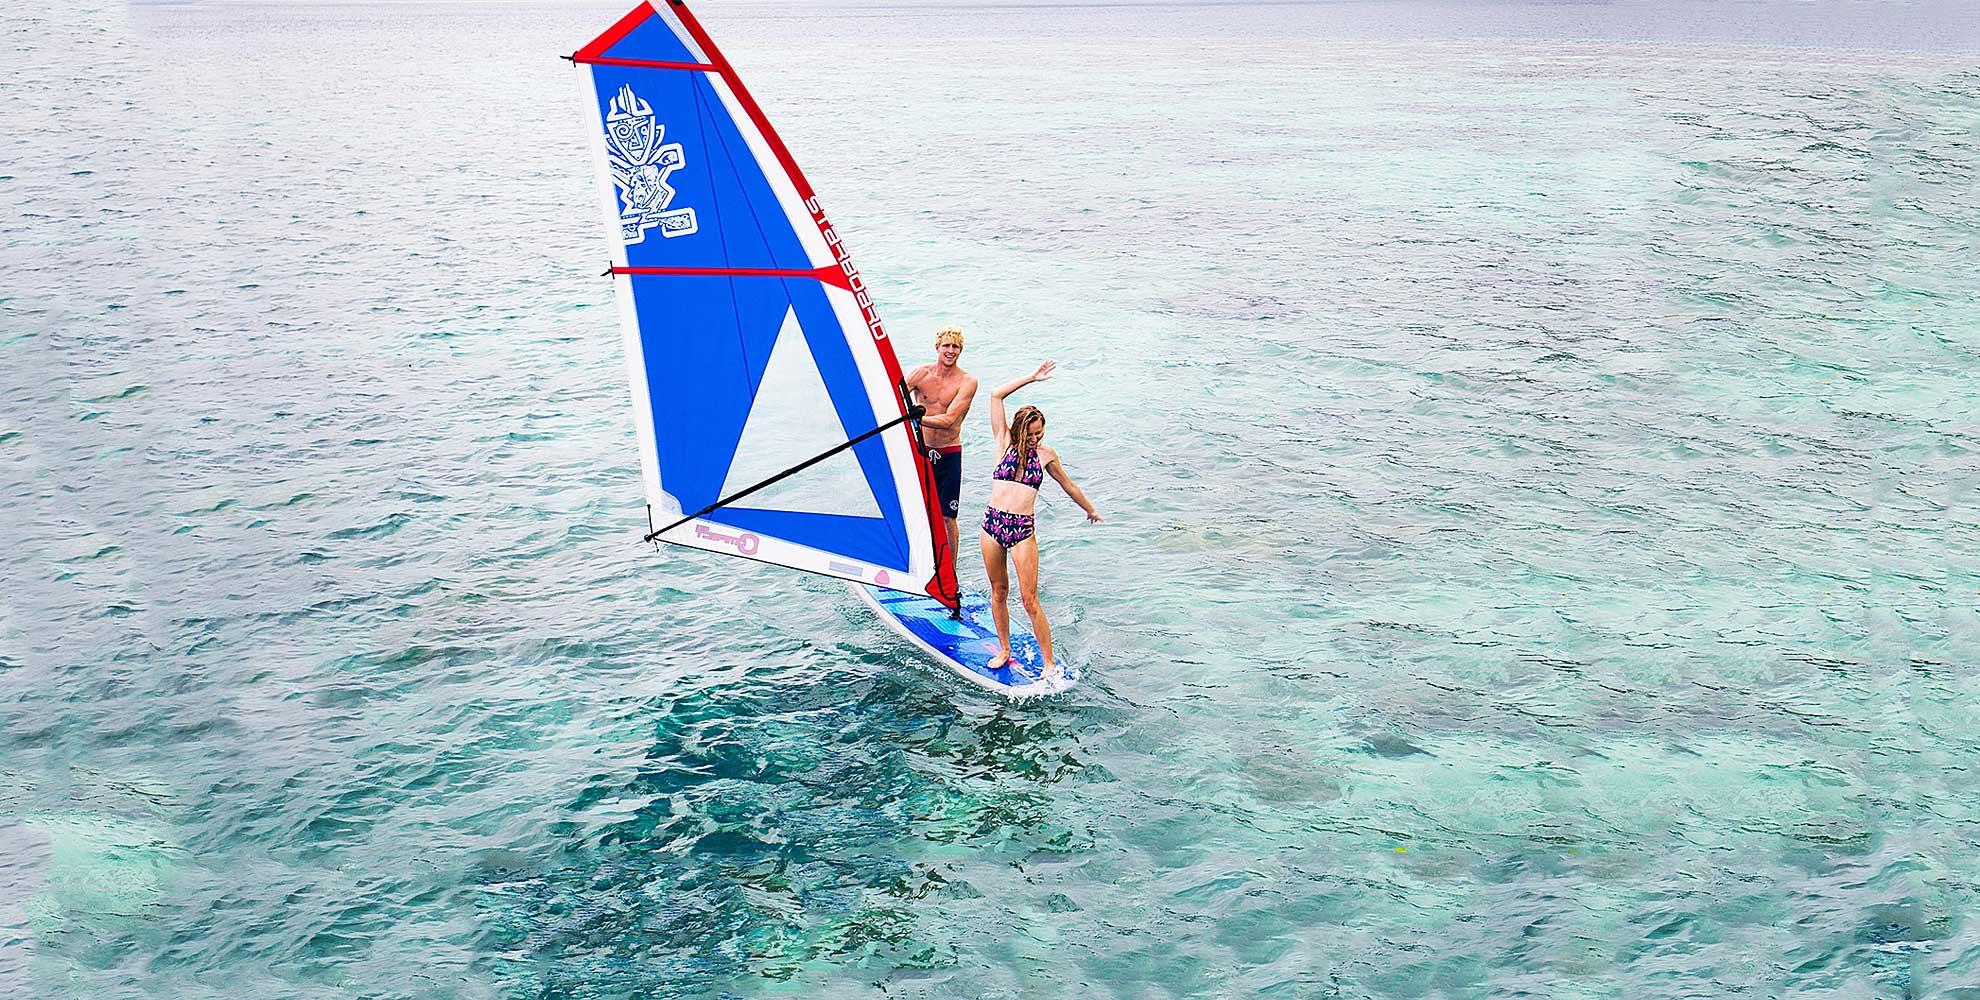 SUP Windsurfing Sails 2020 - Starboard Windsurfing